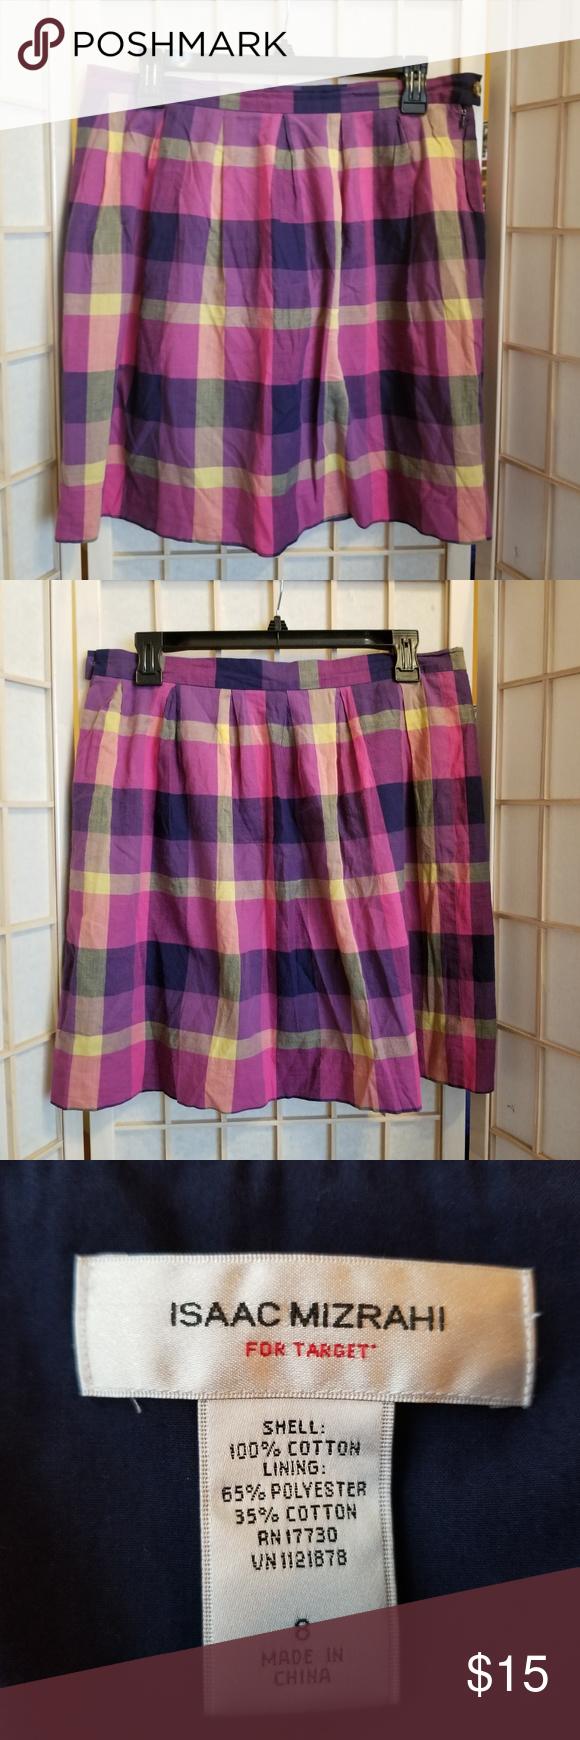 29ba2e6079 Isaac Mizrahi Target Plaid Skirt Size: 8 Waist (flat): 15.5